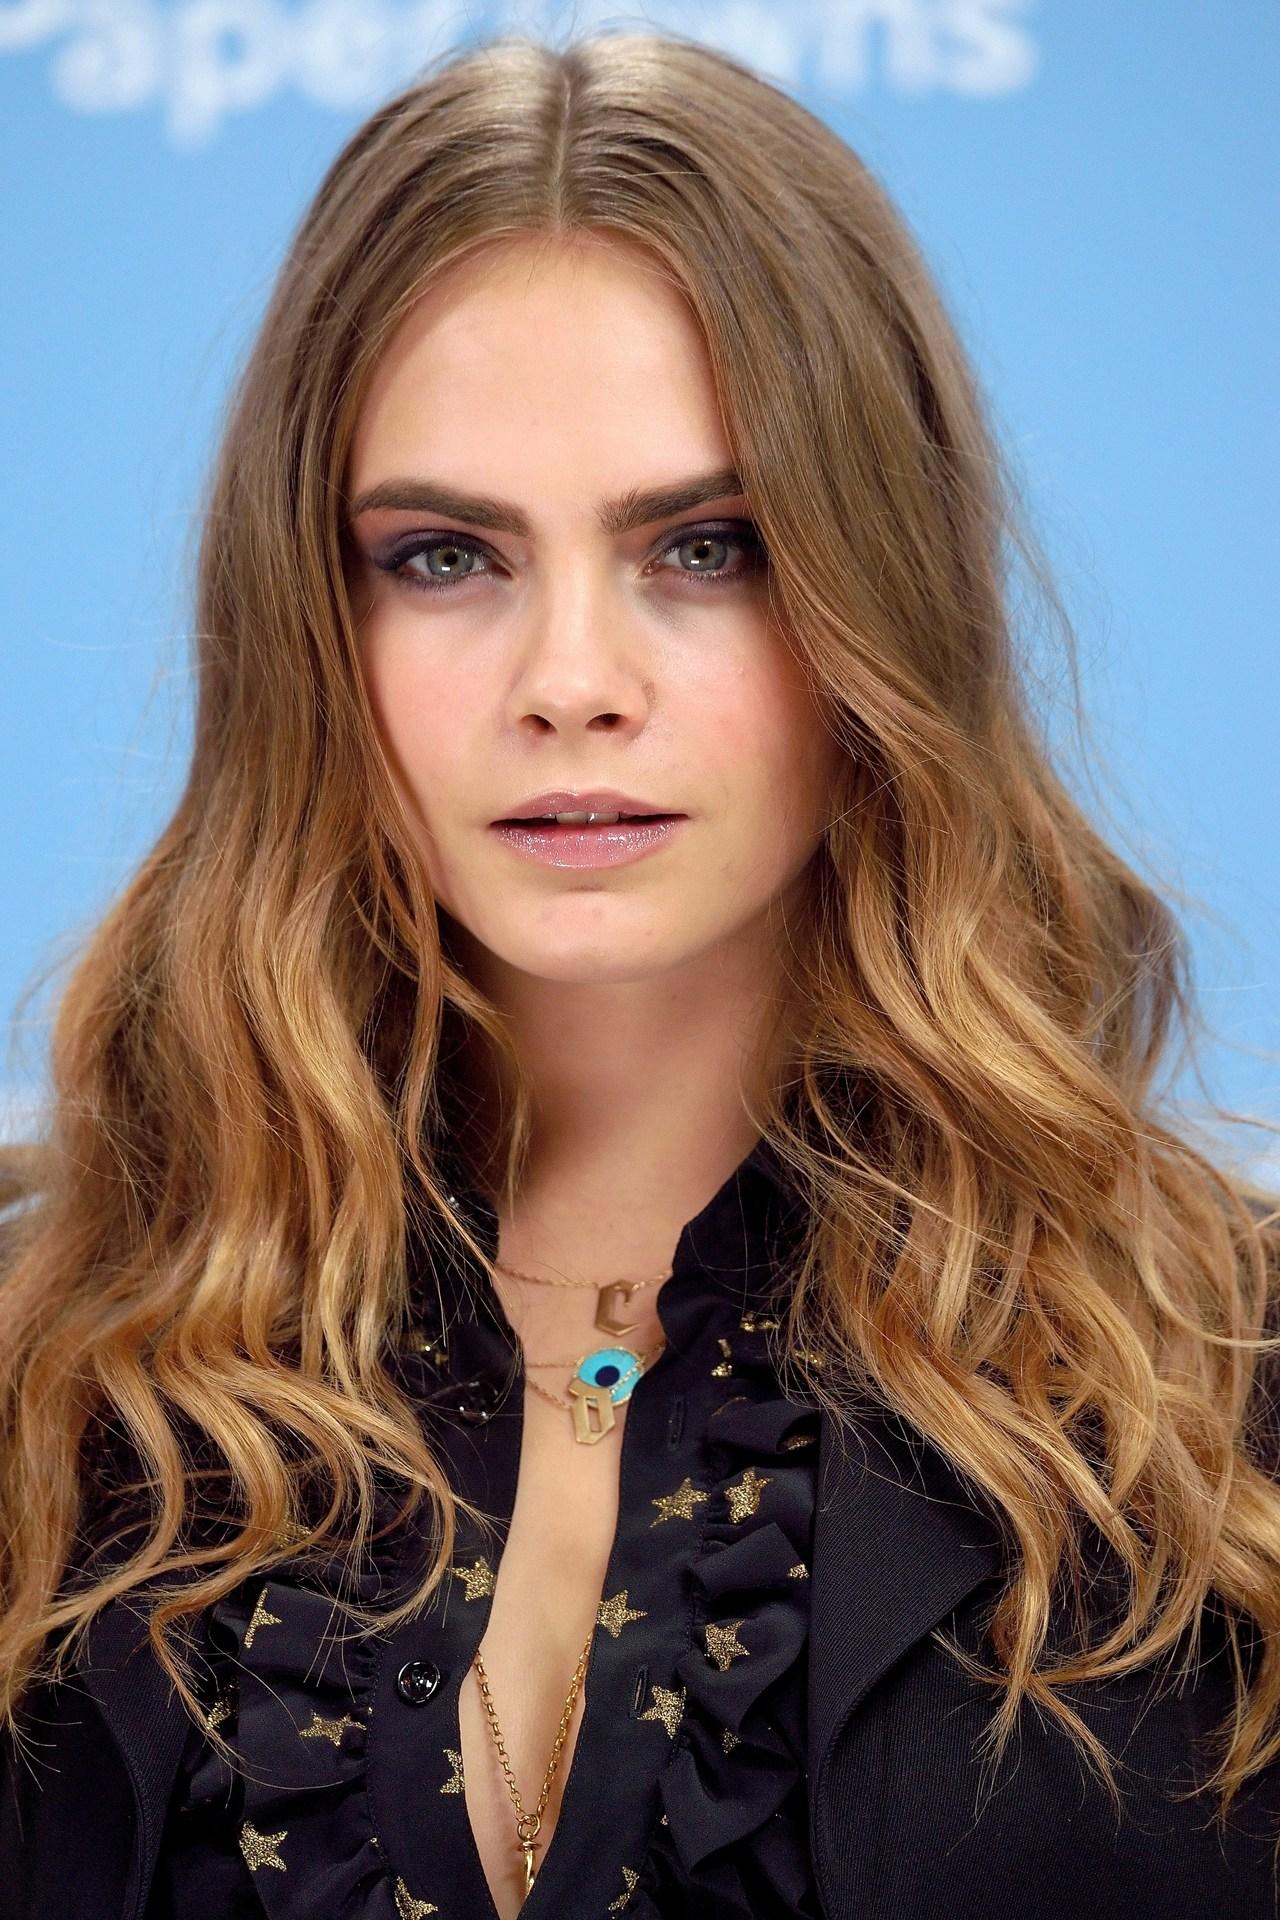 Cara-Delevingne-Vogue-3Jul15-Getty_b